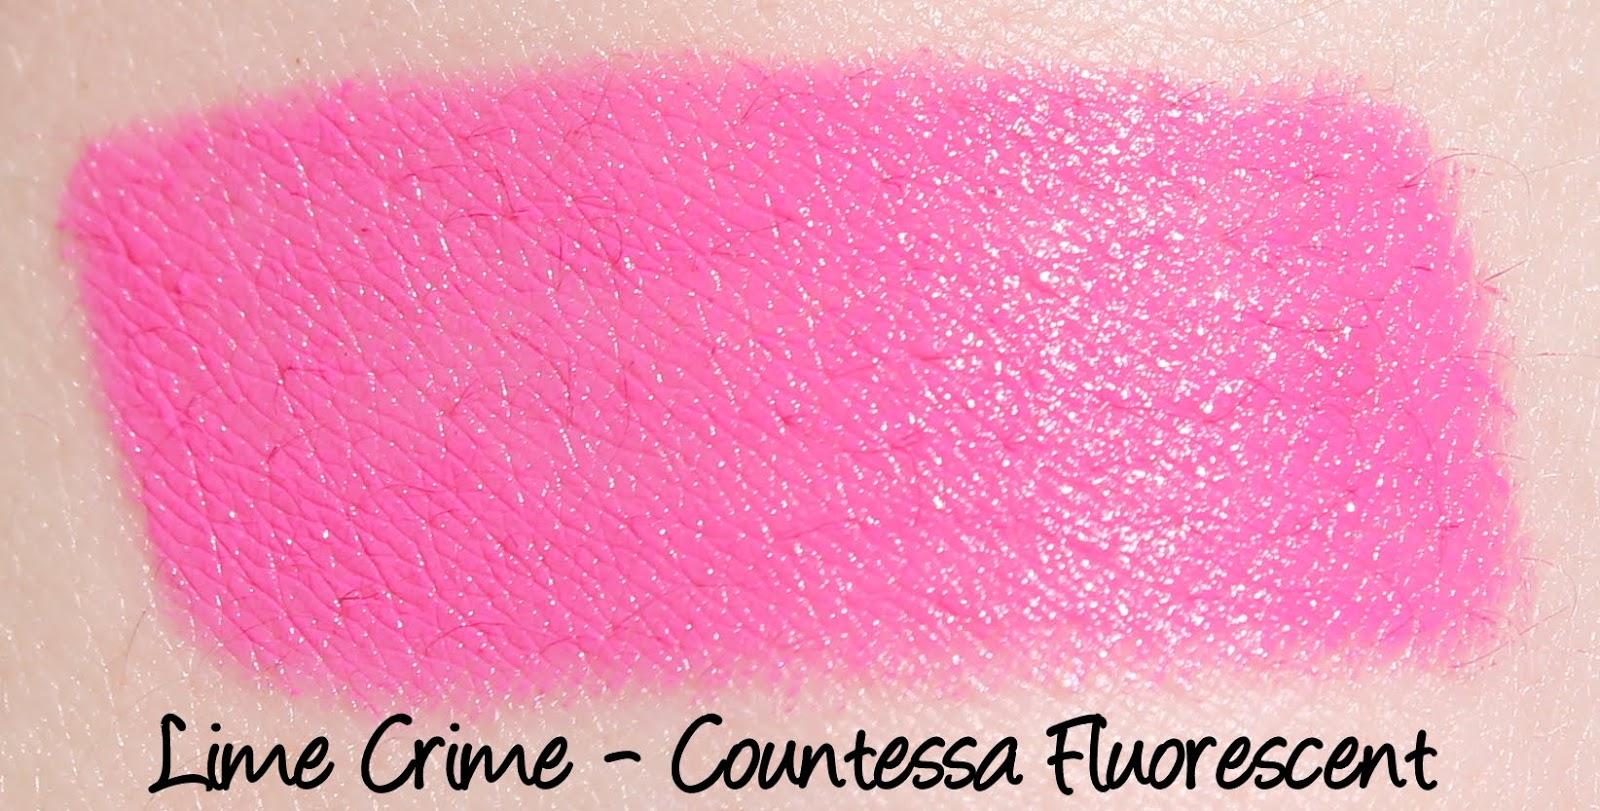 Lime Crime Countessa Fluorescent Lipstick Swatch